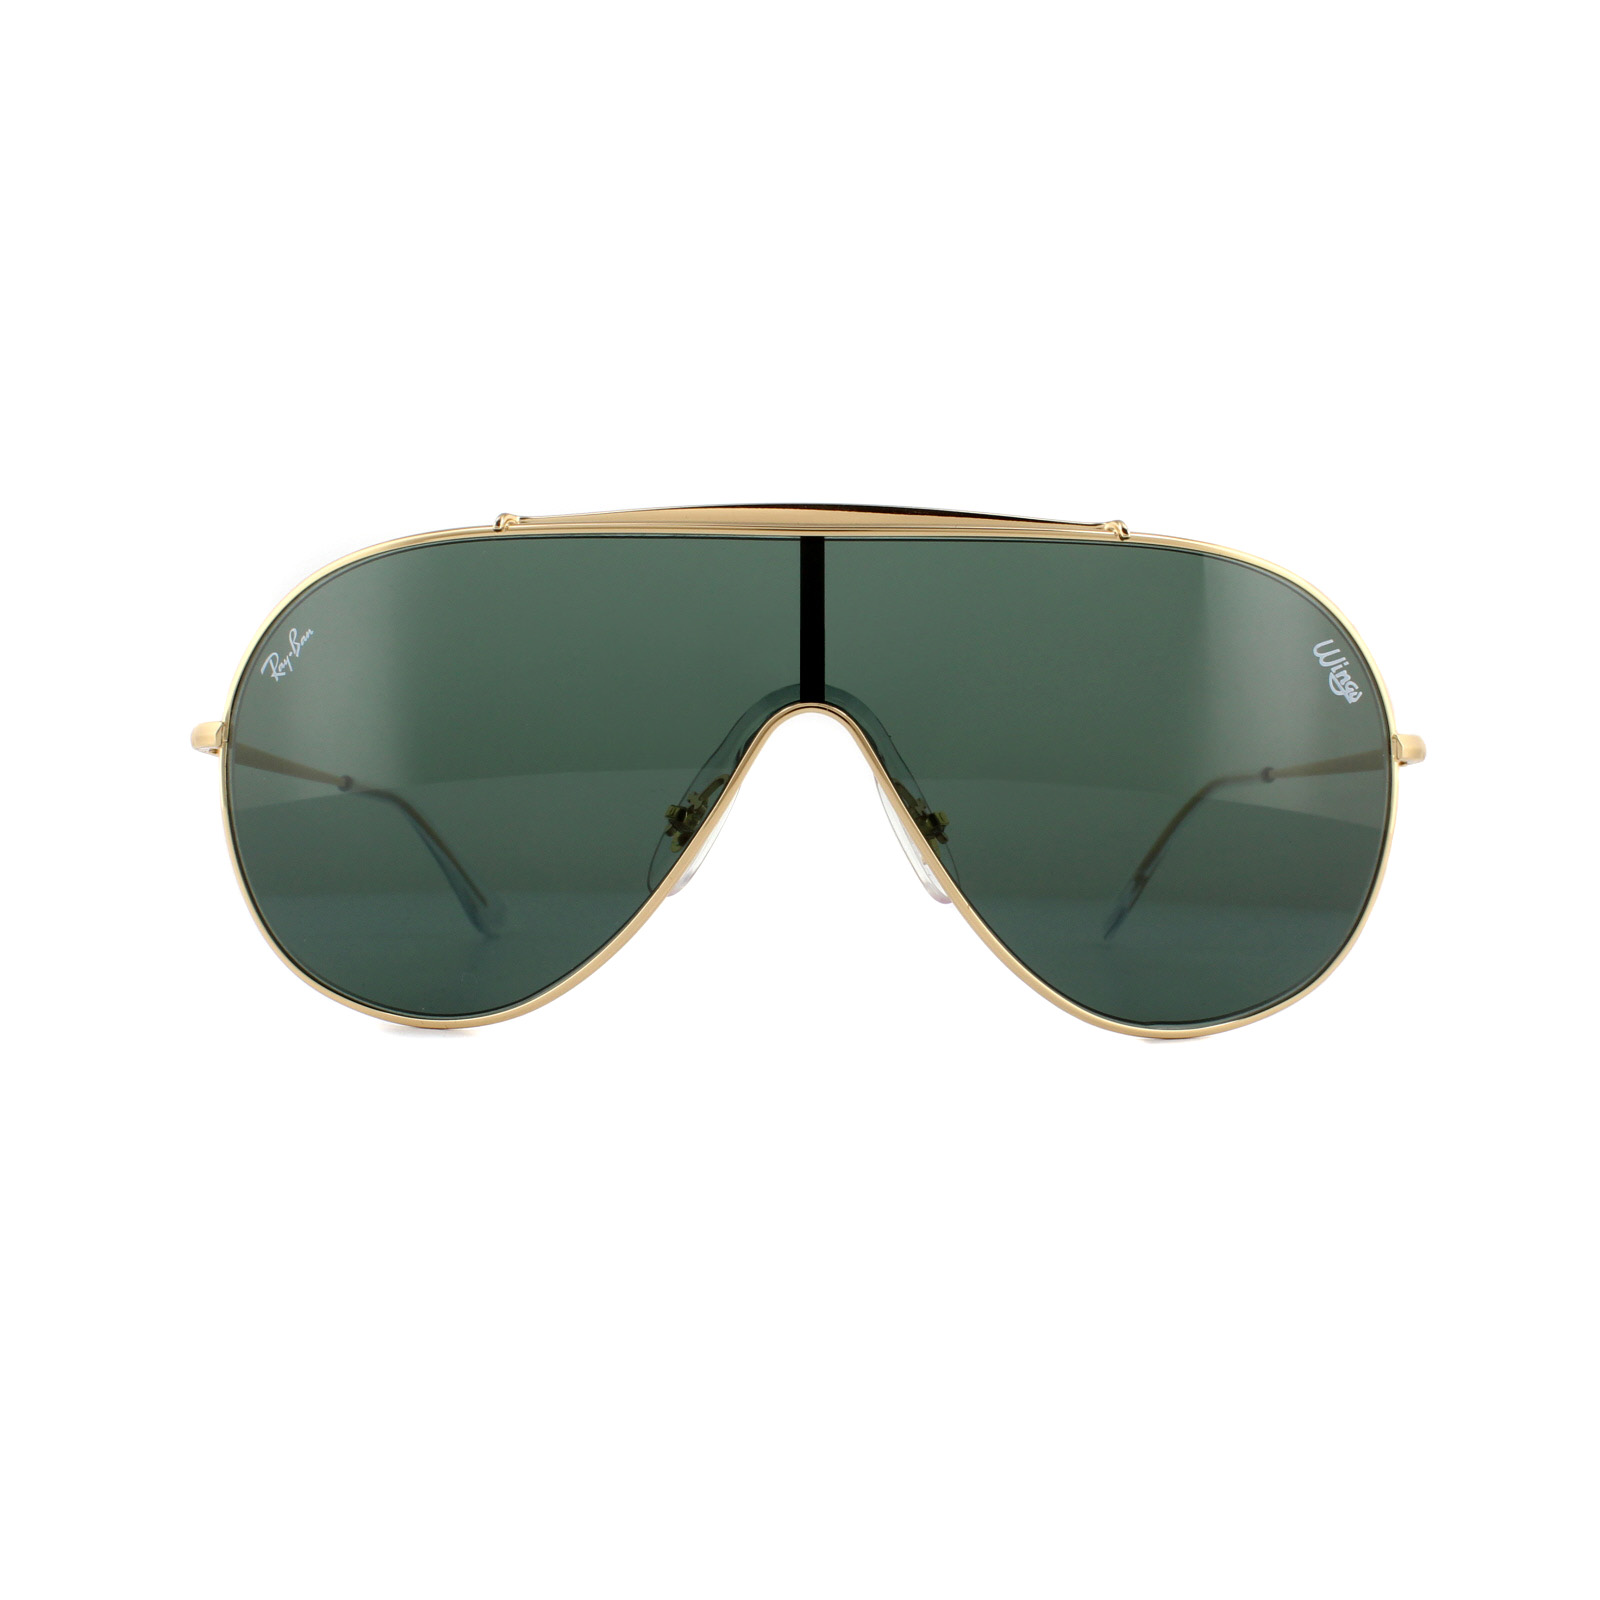 f86187e03a6 Sentinel ray ban sunglasses wings gold dark green jpg 1600x1600 Ray ban  wings